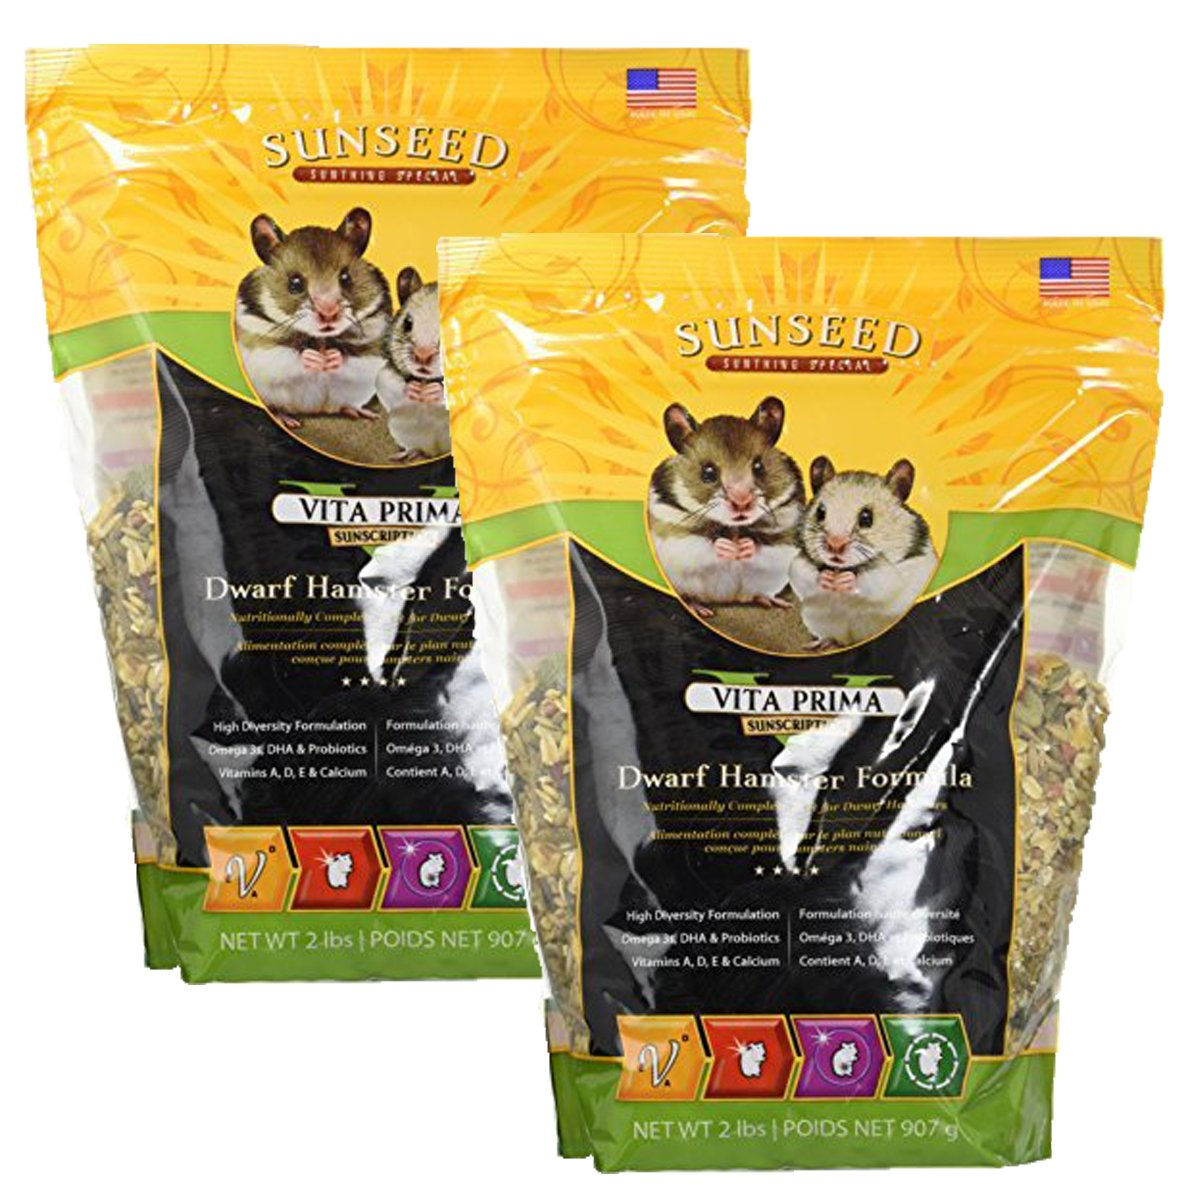 Sunseed Vita Prima Sunscription Dwarf Hamster Formula (2 lb / 2 Pack)